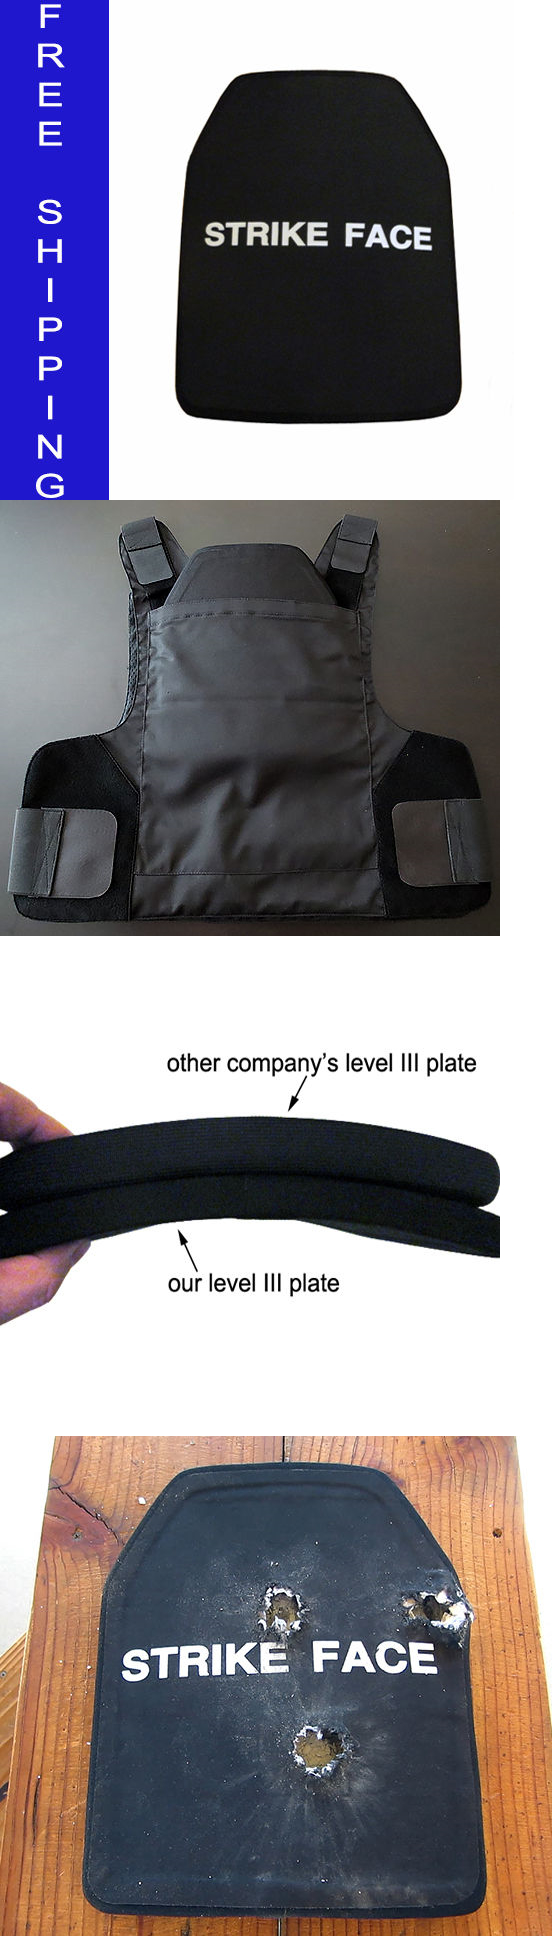 Body Armor and Plates 102537 Skarr Armor® Nij Level Iii + Ceramic Rifle Plate & Body Armor and Plates 102537: Skarr Armor® Nij Level Iii + Ceramic ...